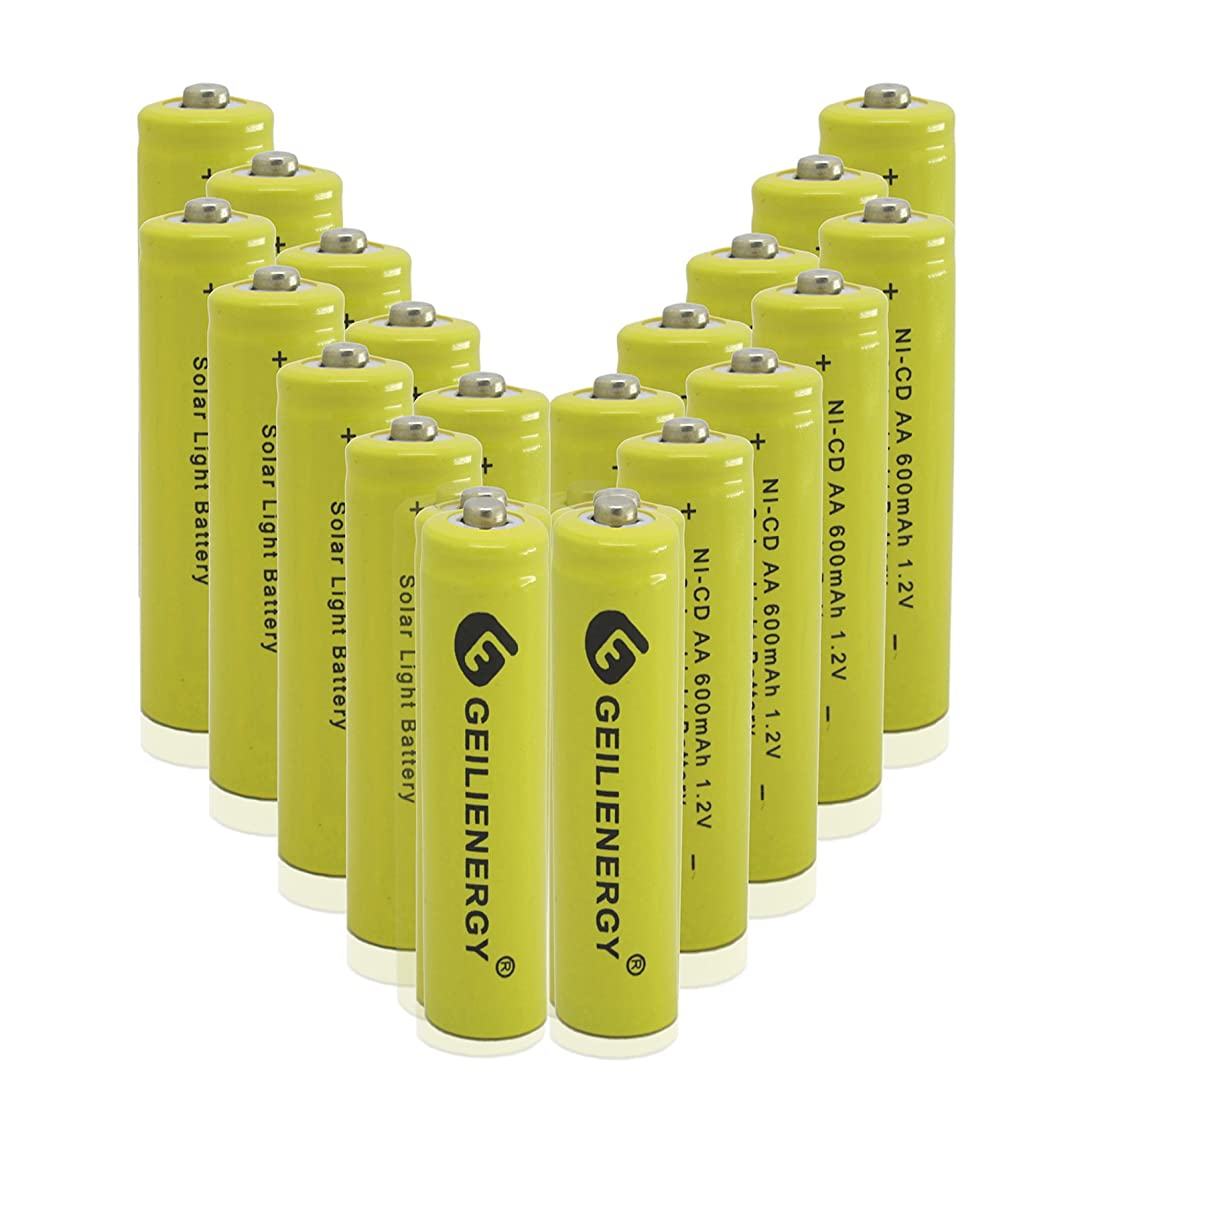 GEILIENERGY Solar Light AA Ni-CD 600mAh Rechargeable Batteries,AA Rechargeable Batteries for Solar Lights Solar Lamp(Pack of 20)